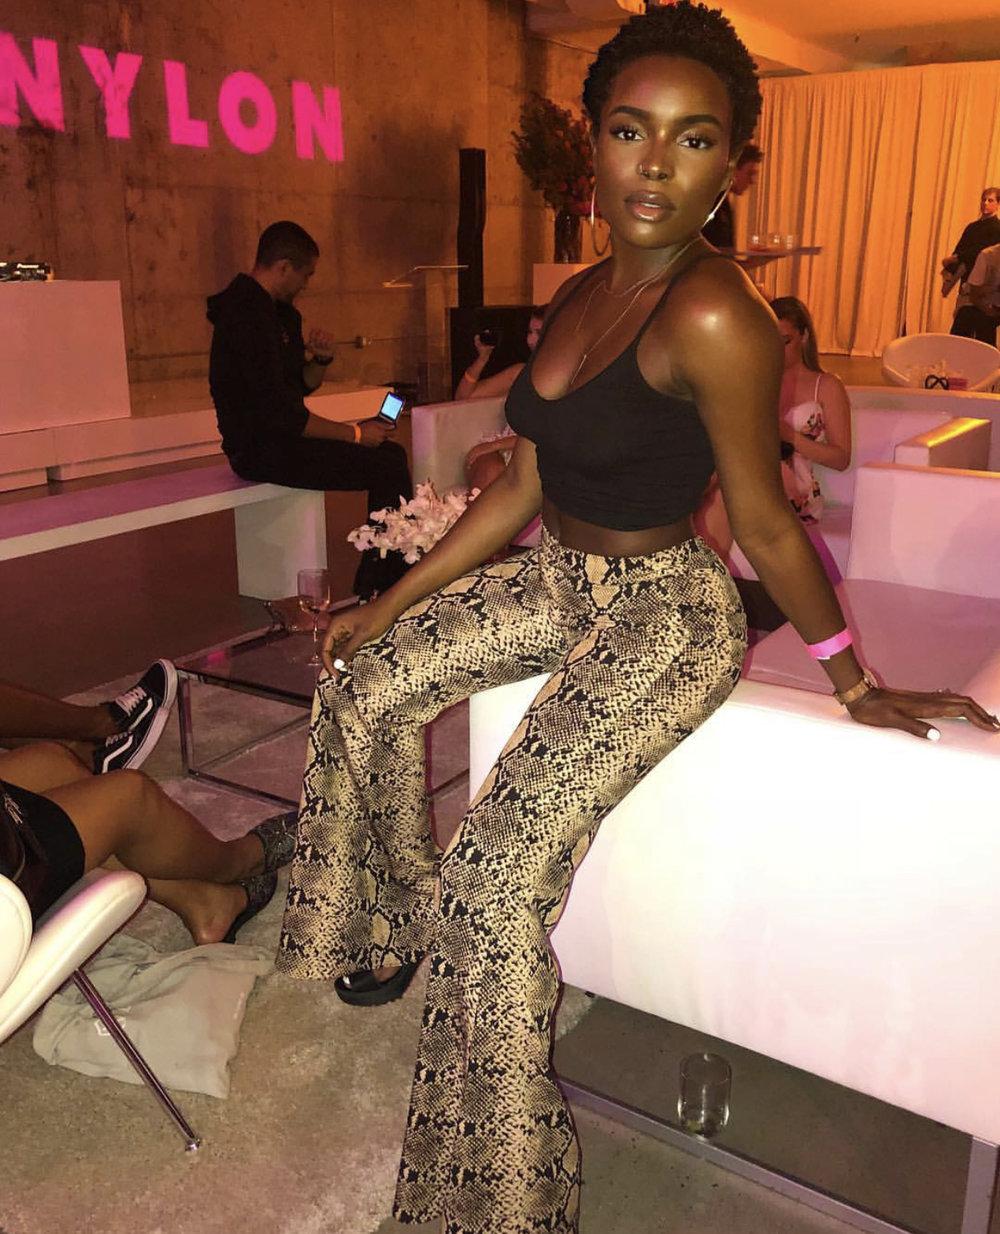 Avielle Amor attending Nylon Beauty Awards Presented by Clairisonic